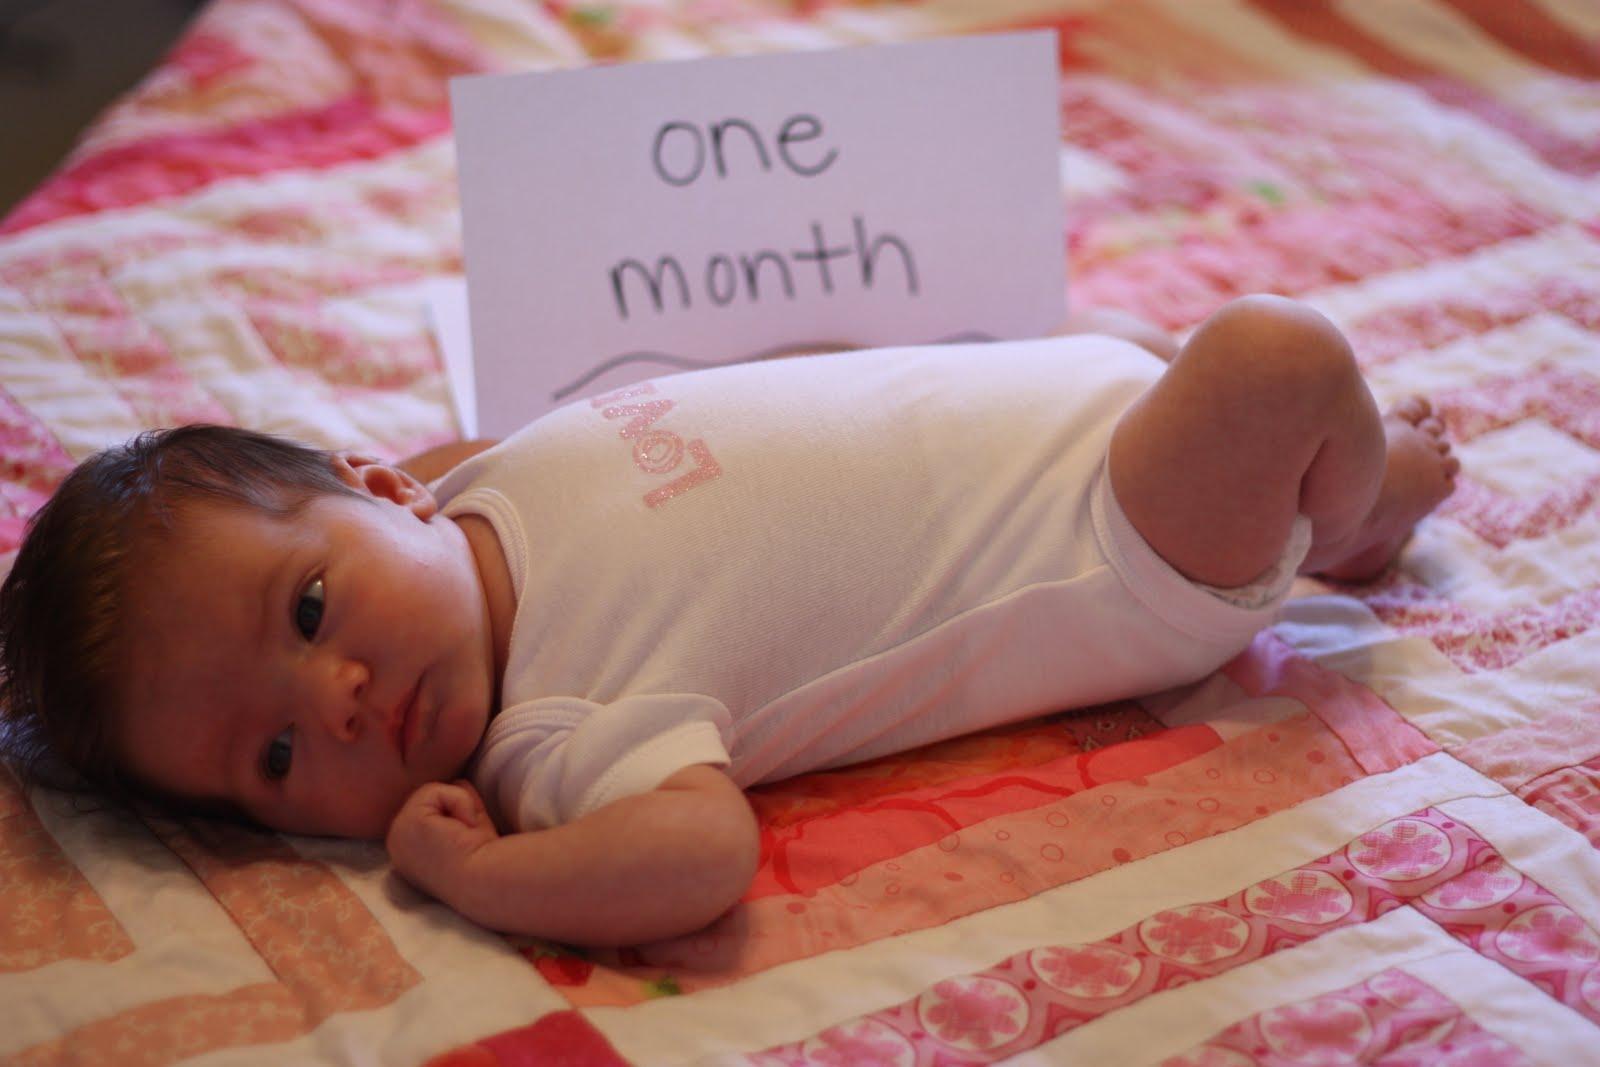 eff2e1c961f9 One Month Update - 5.25.2011 - Love